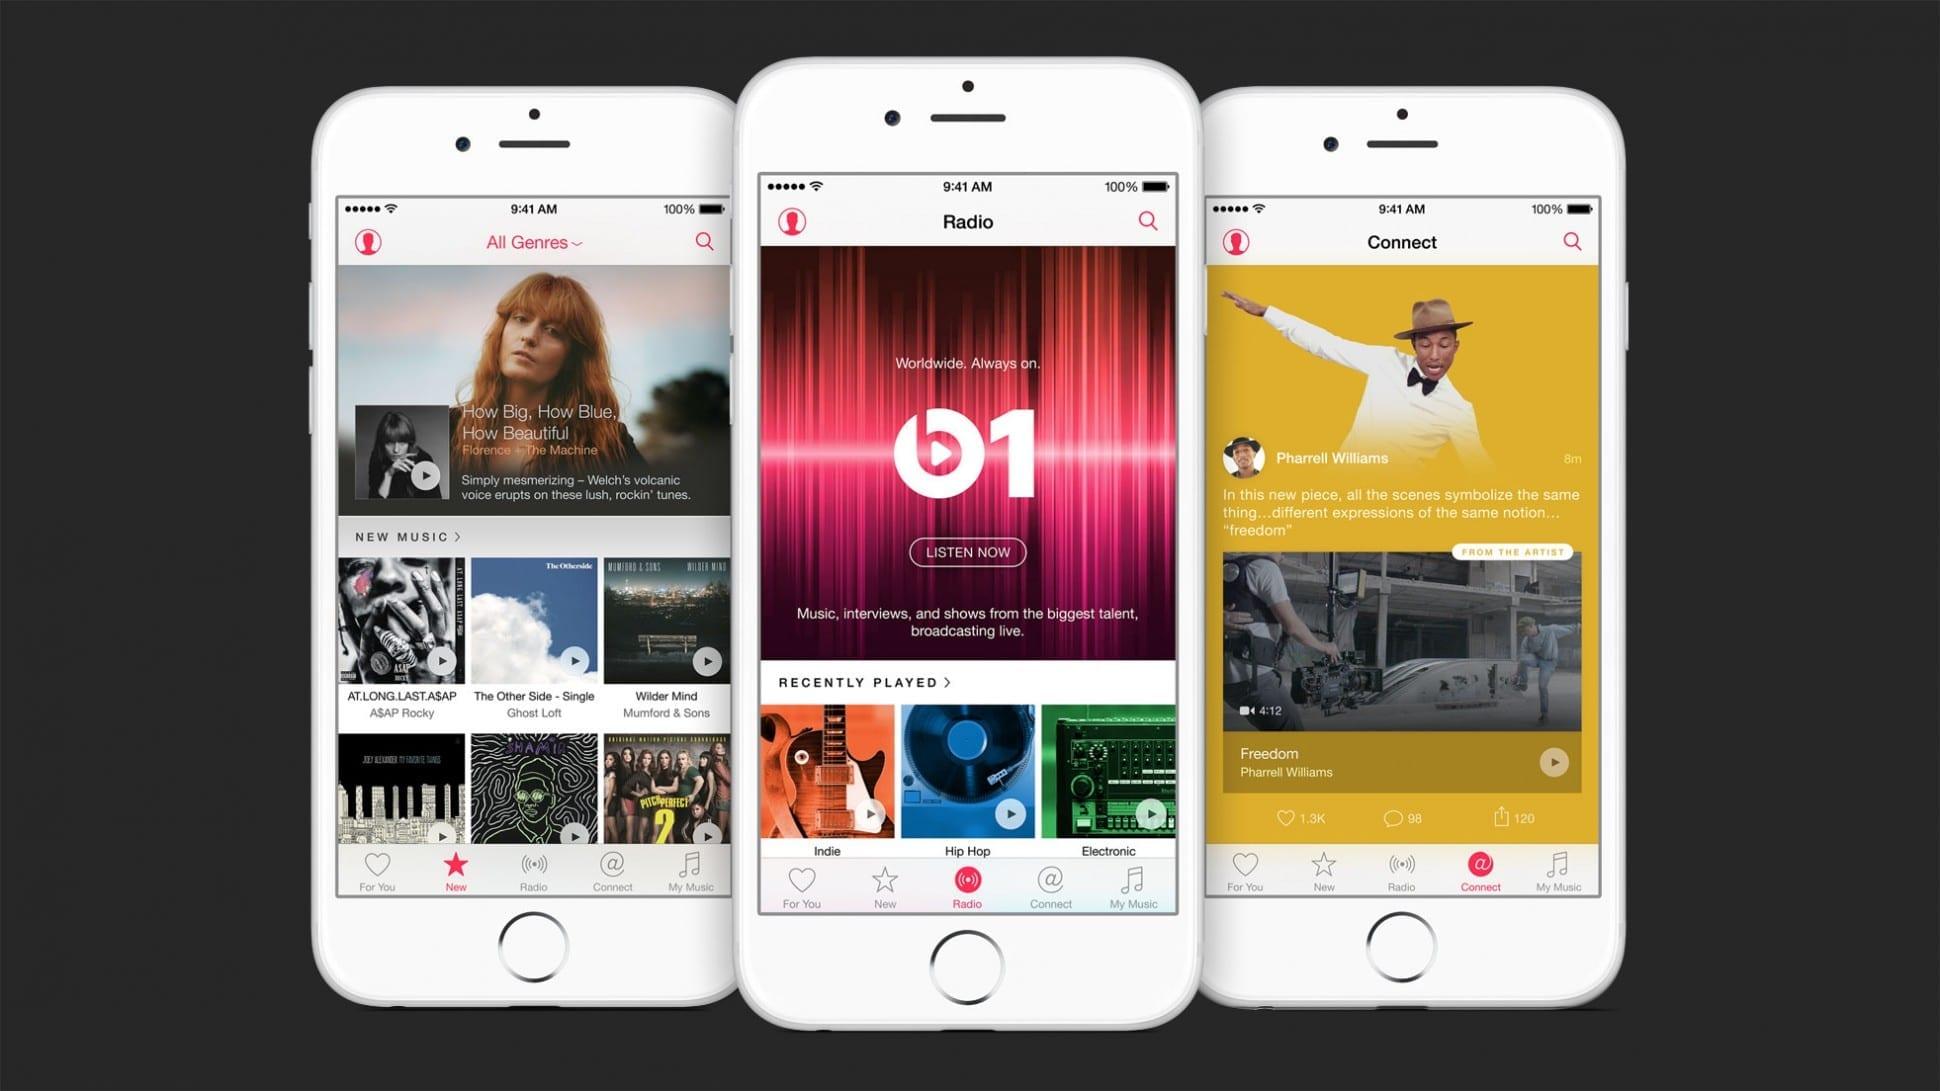 Apple Music: The Lowdown